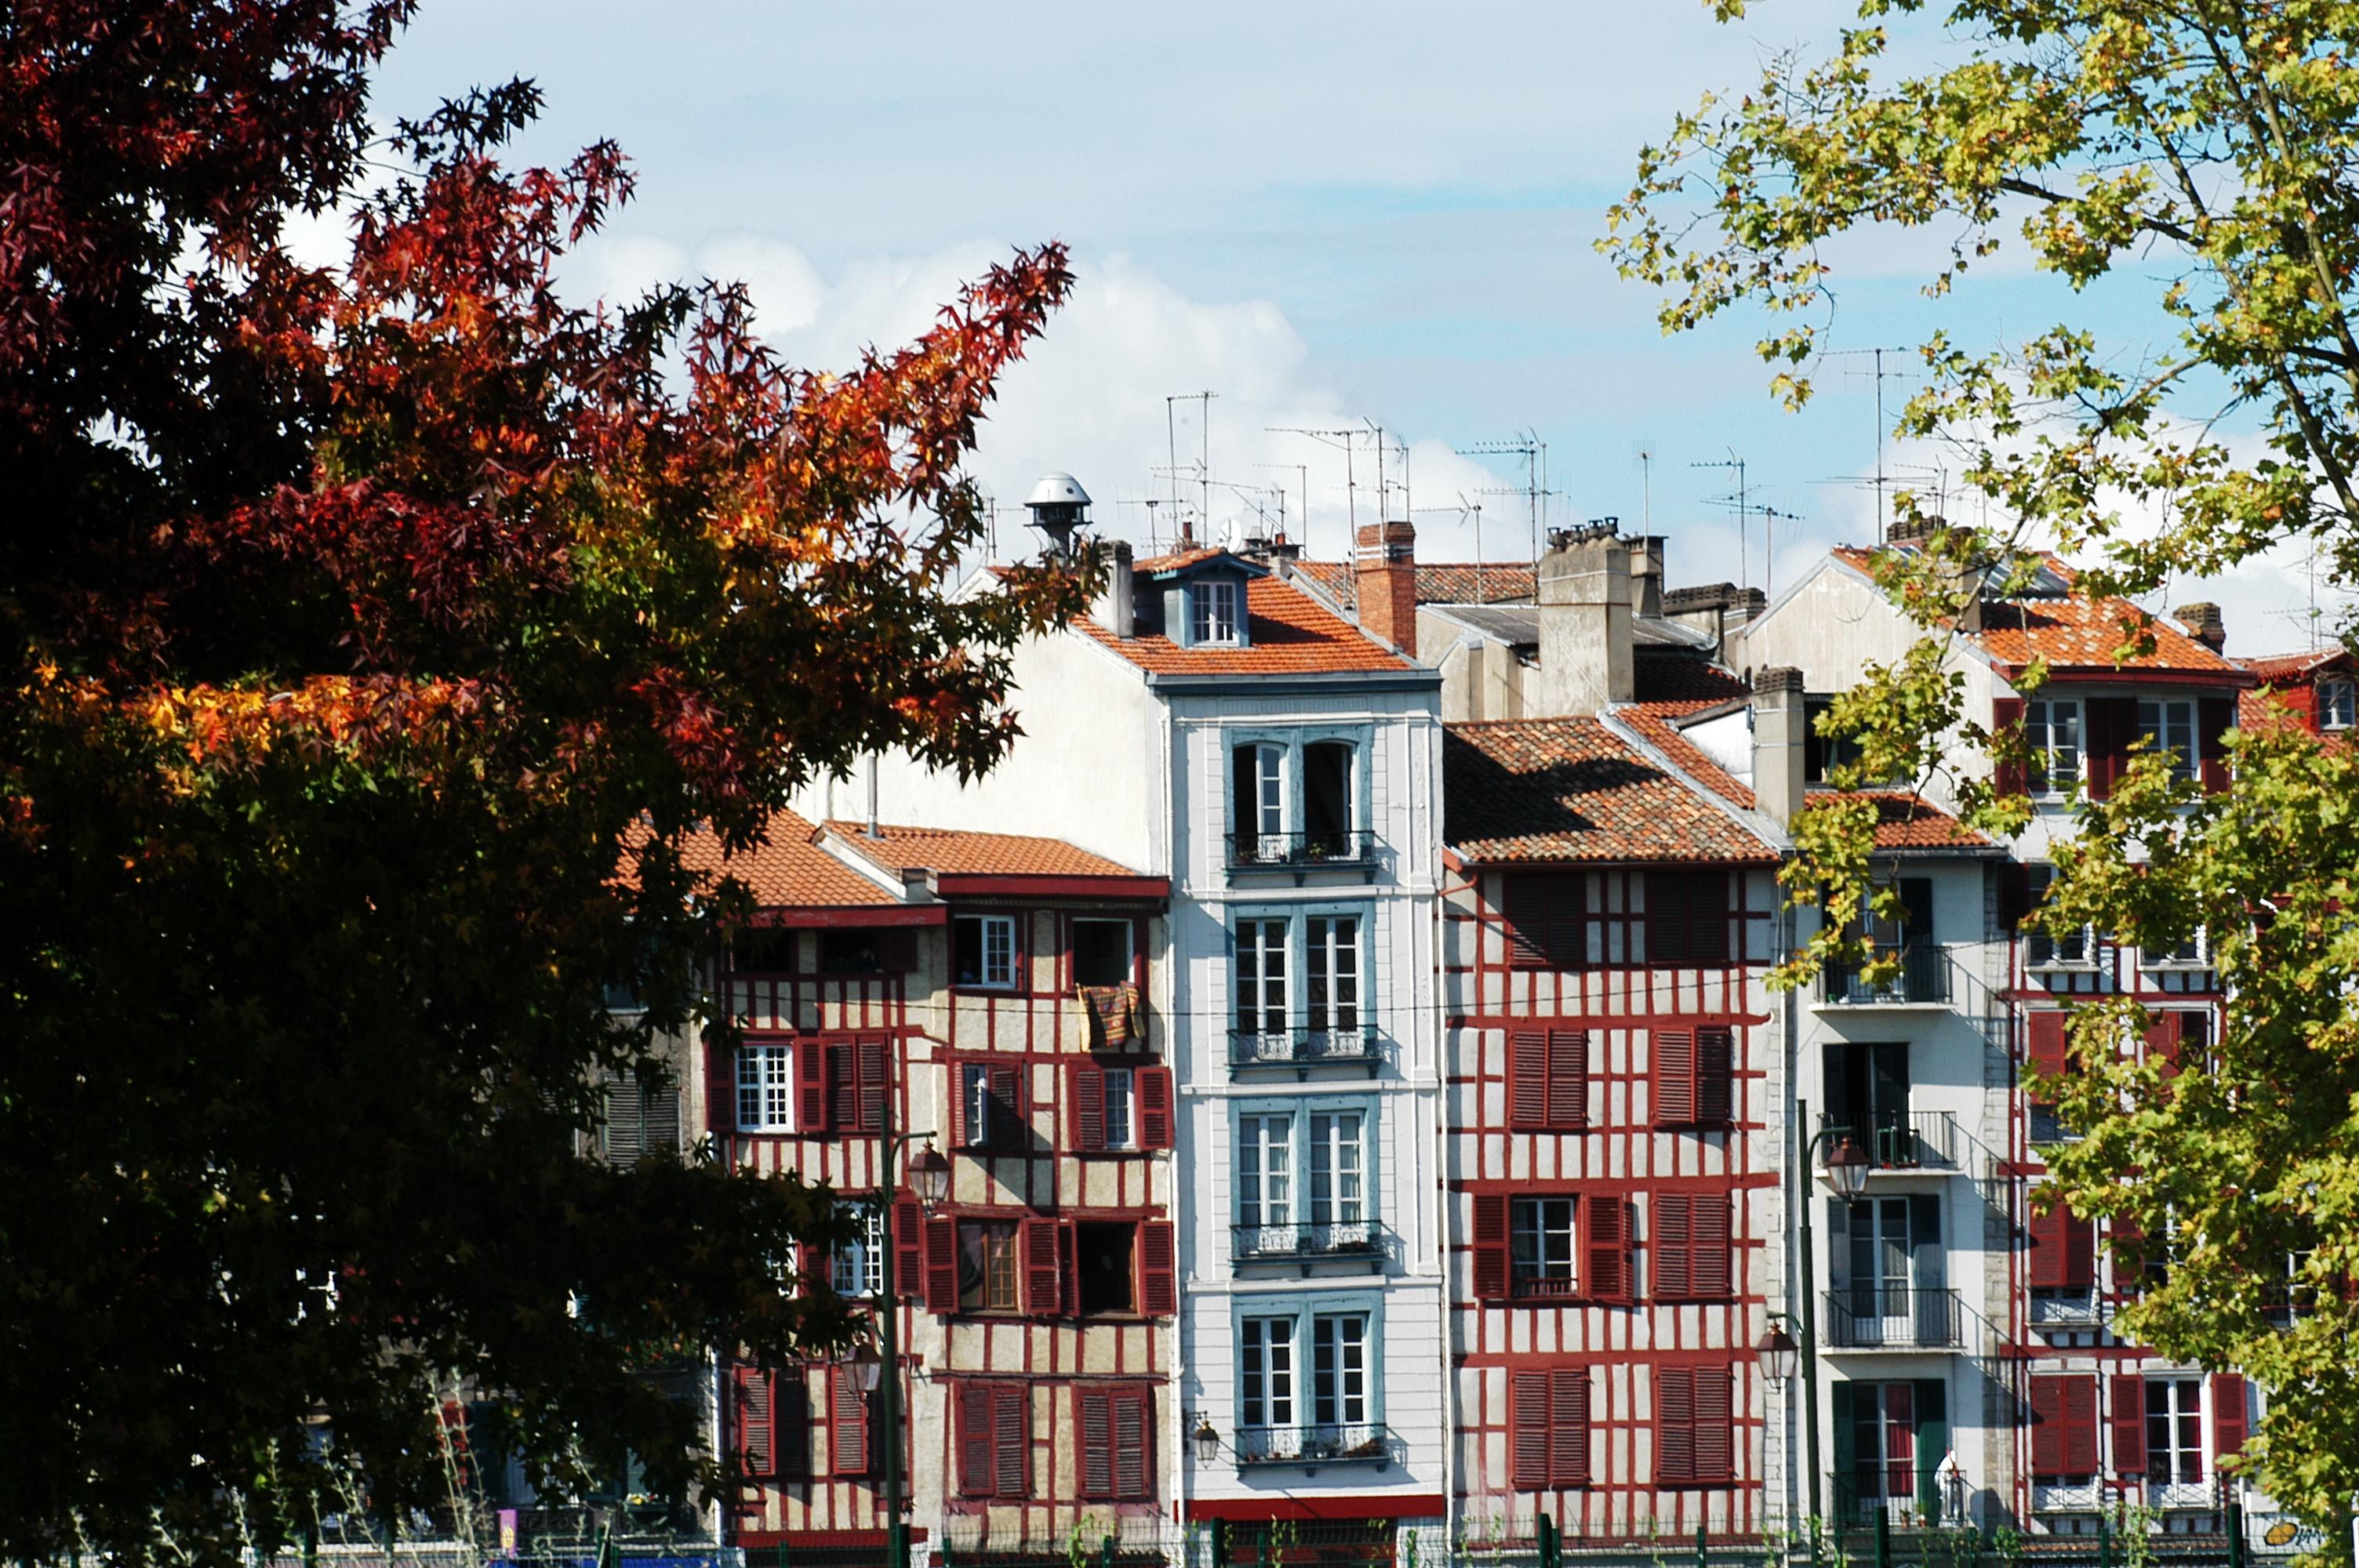 Allée De Niert Bayonne bayonne/biarritz/st jean de luz | cruise europe